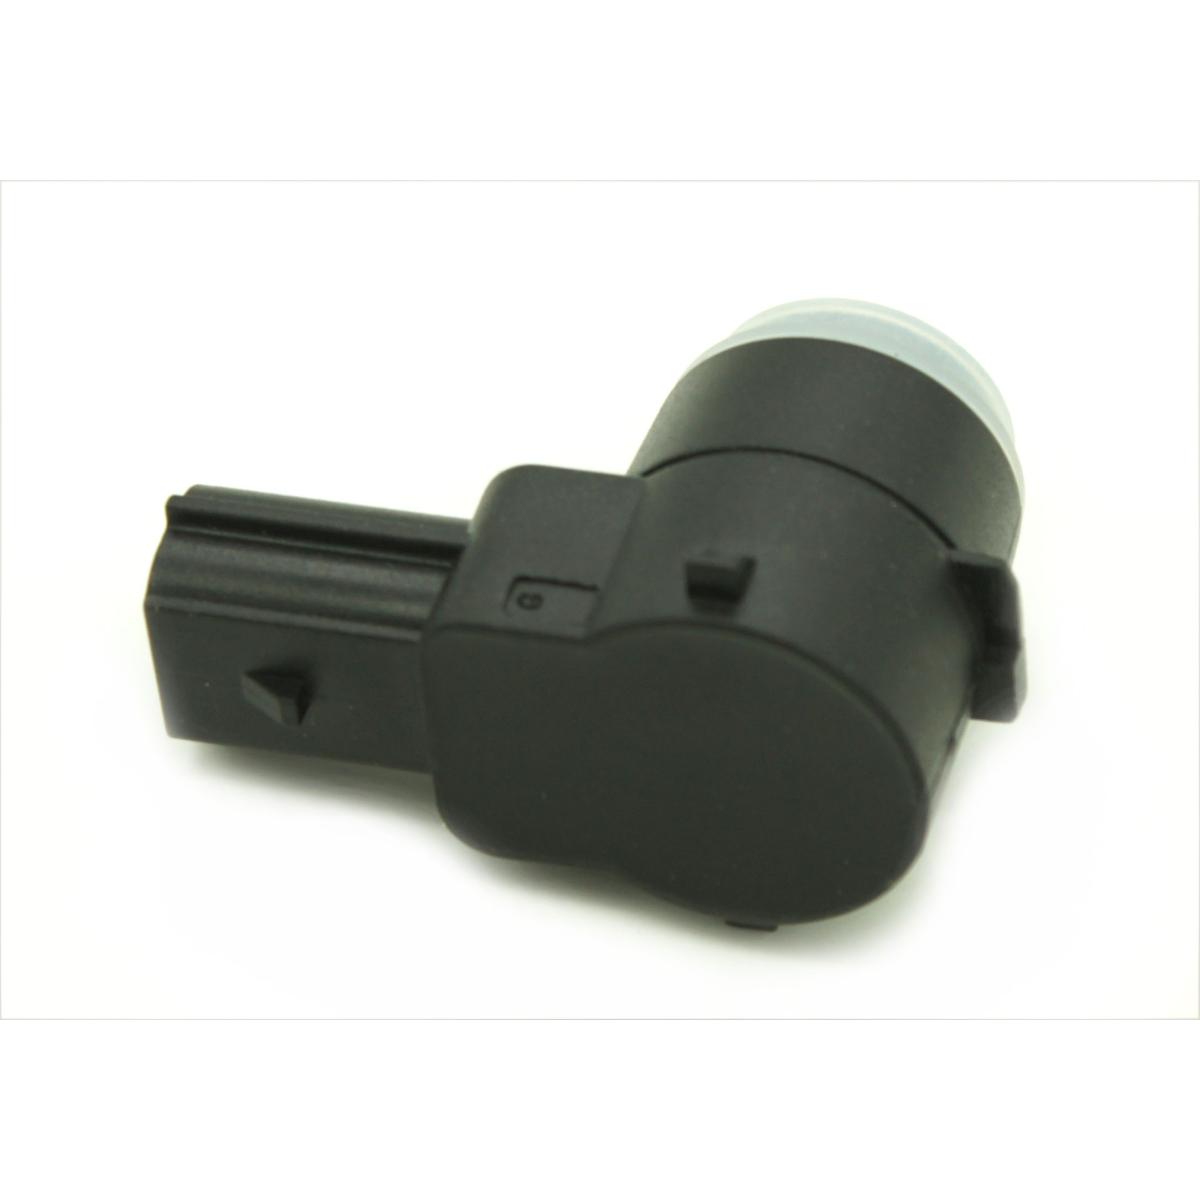 Park sensor 21995584 for GM PDC Parktronic